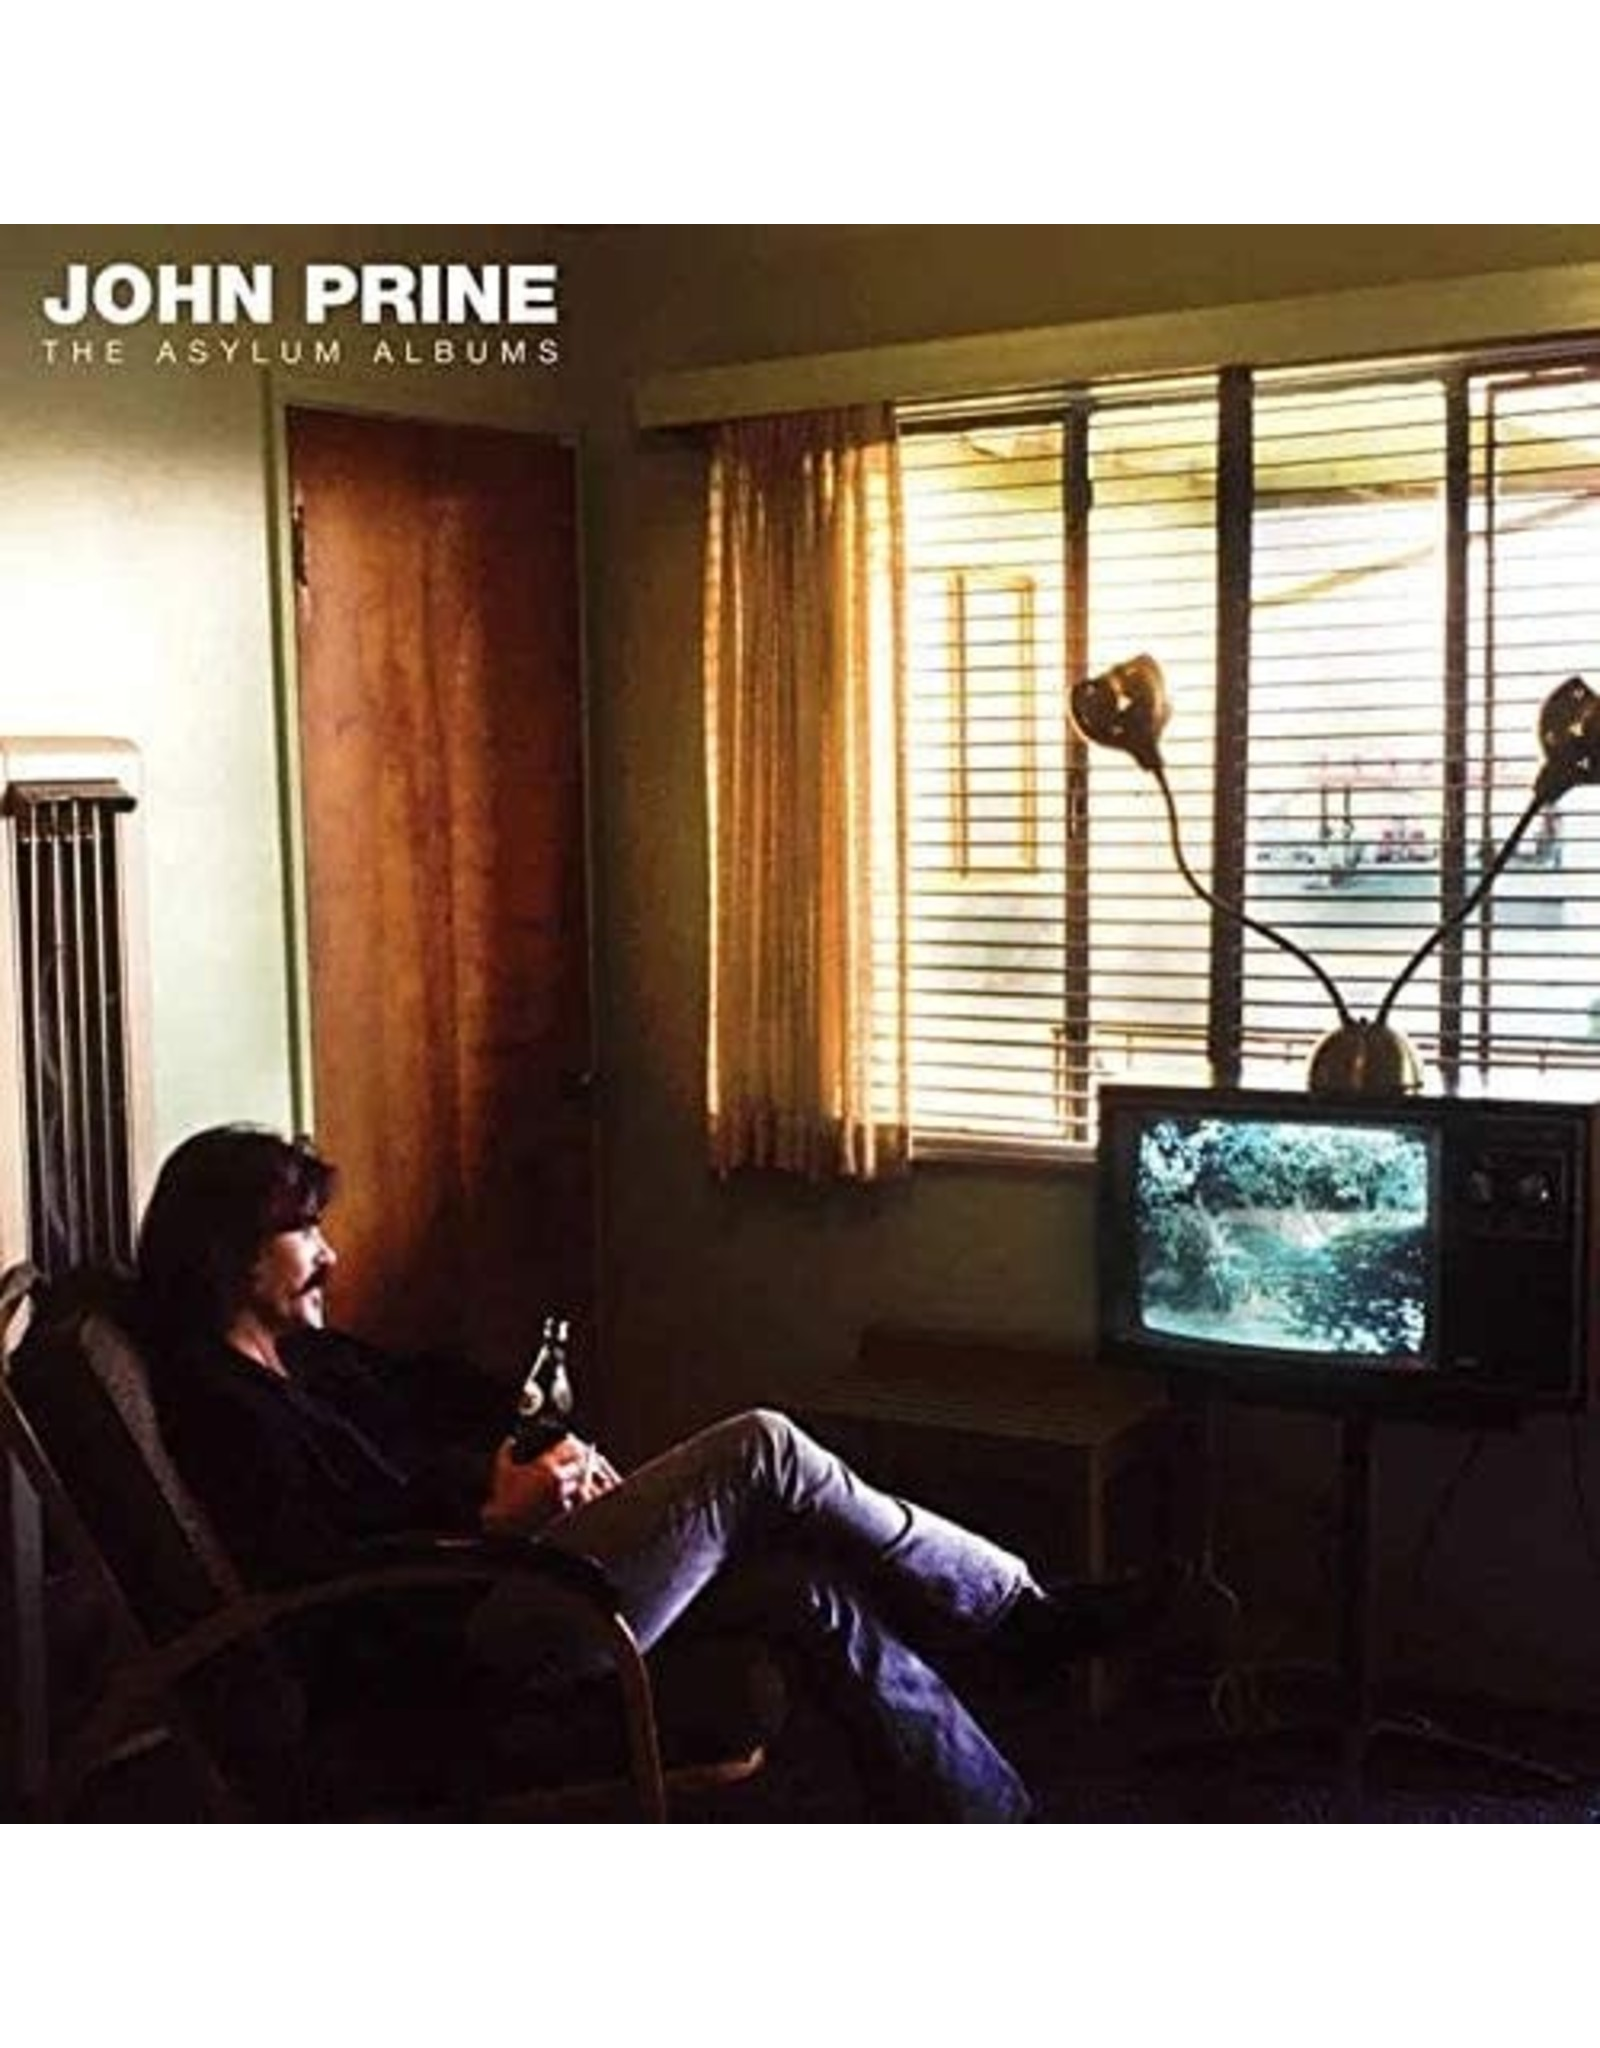 Prine, John - The Asylum Albums 3LP Box